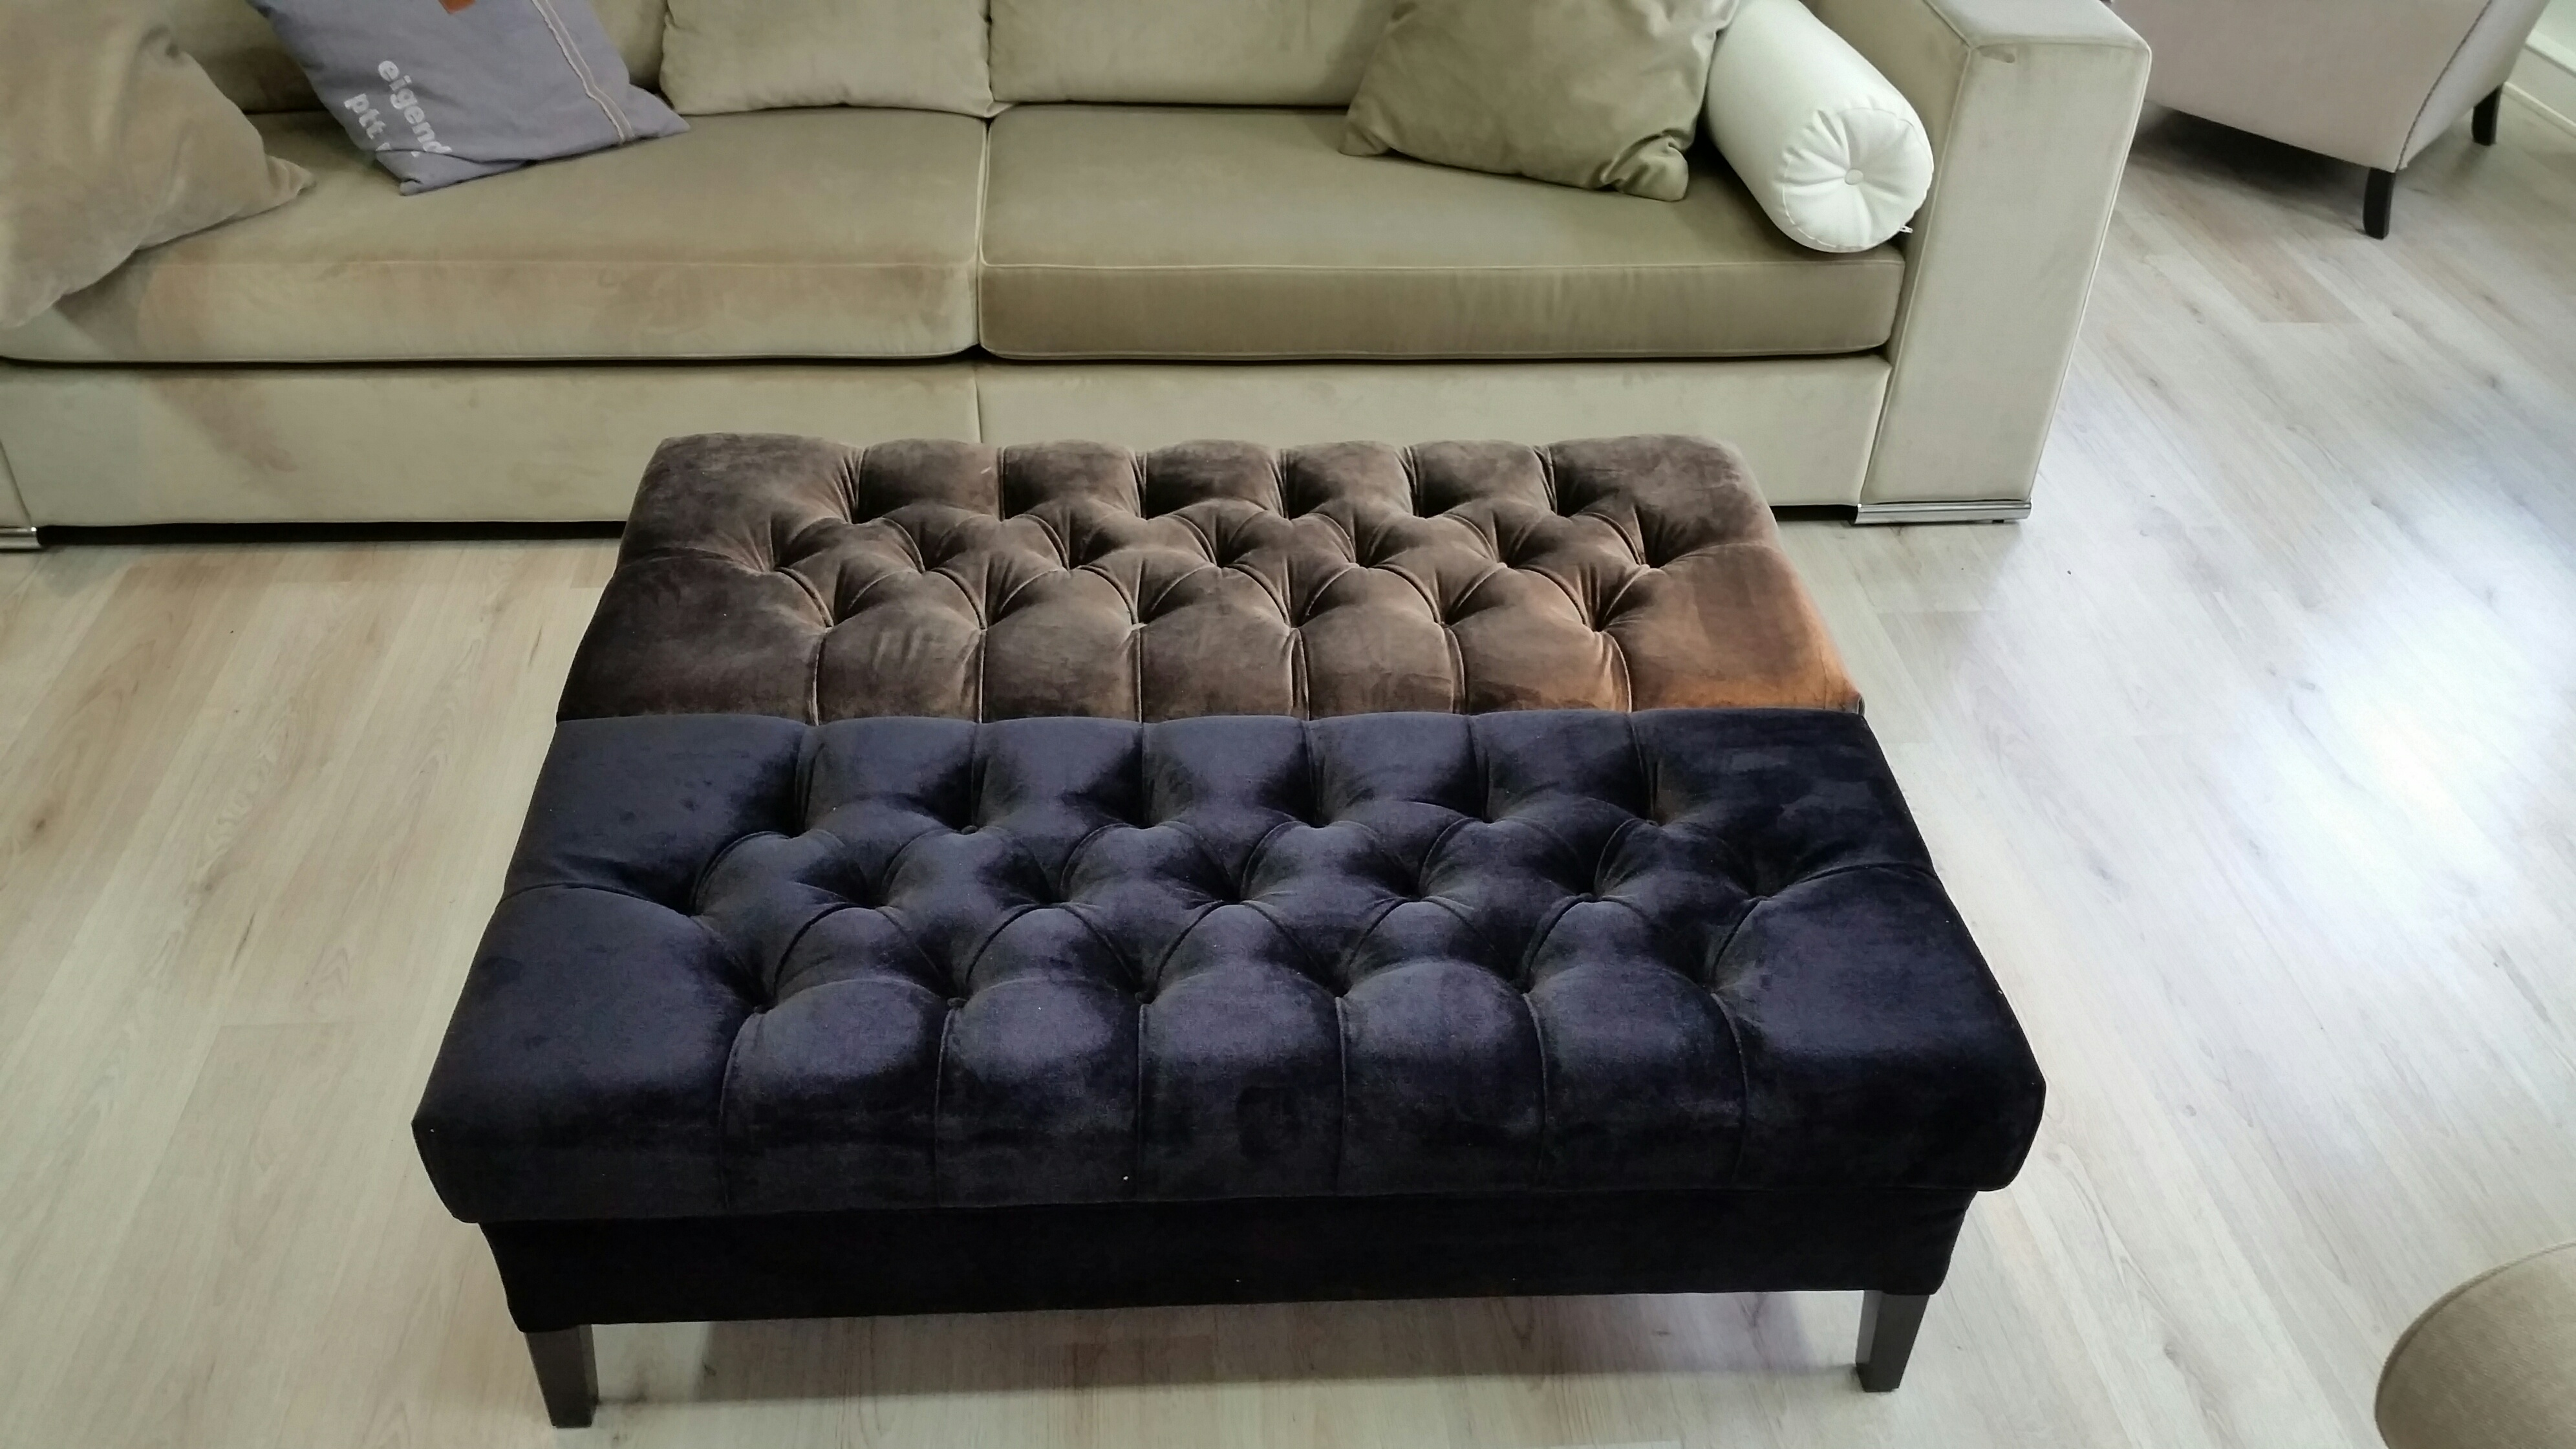 Slaapkamer meubilair | Hoofdborden.nl